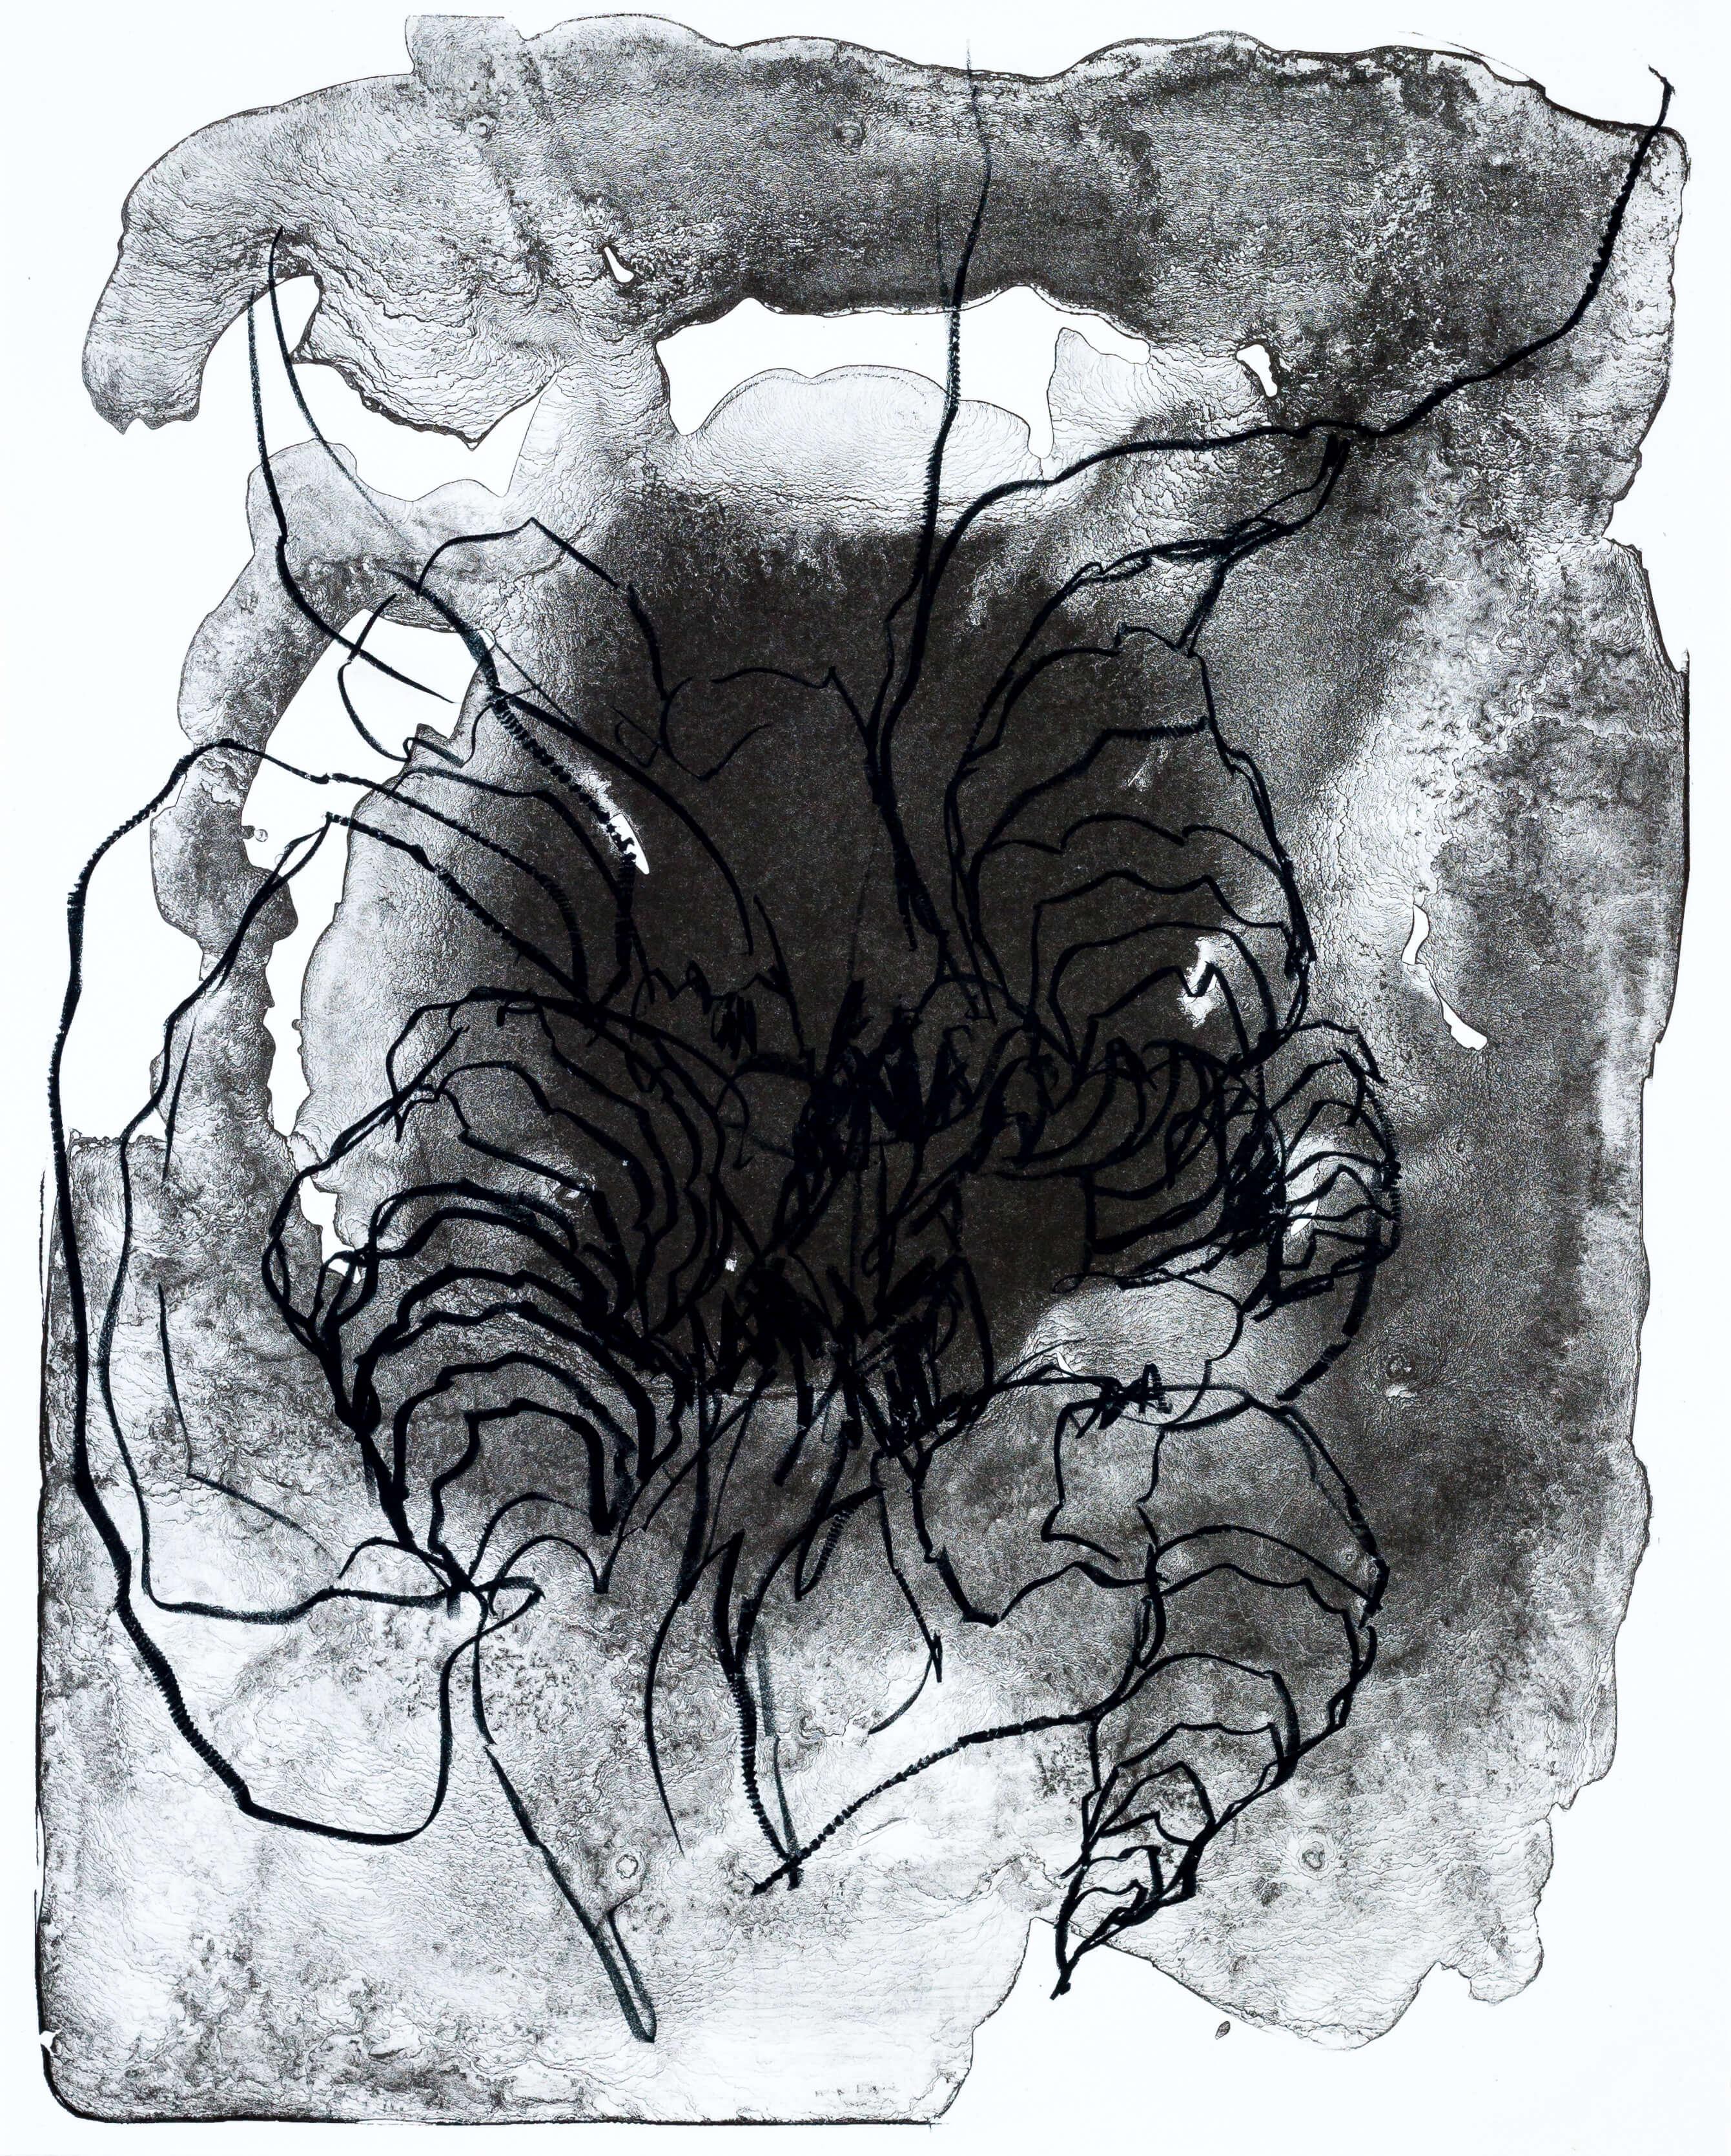 Katharina Albers, organism (Wald) VI, 2016, Farblithographie, Unikat, 50x40 cm